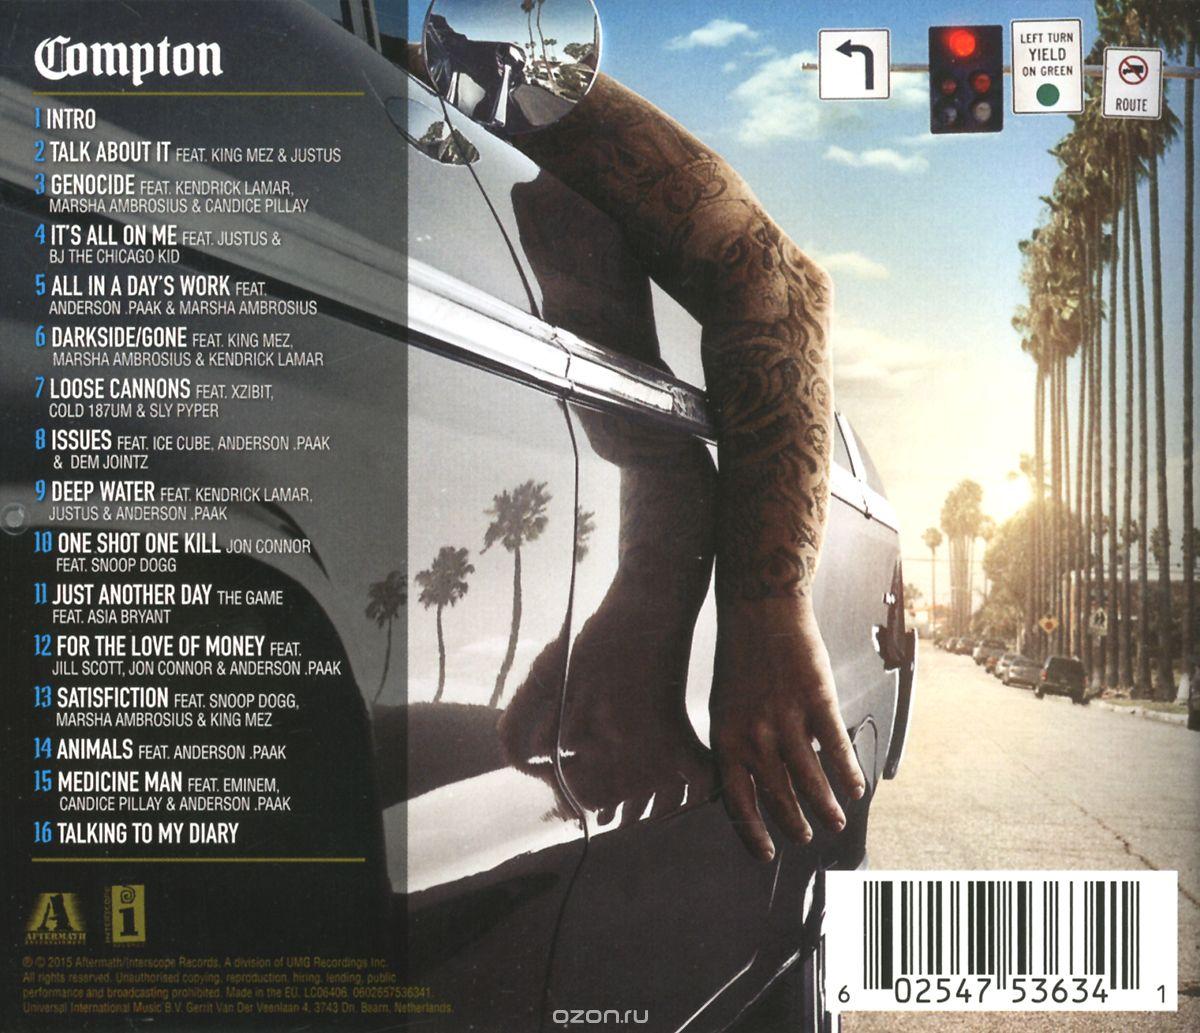 dr dre compton album zip file download